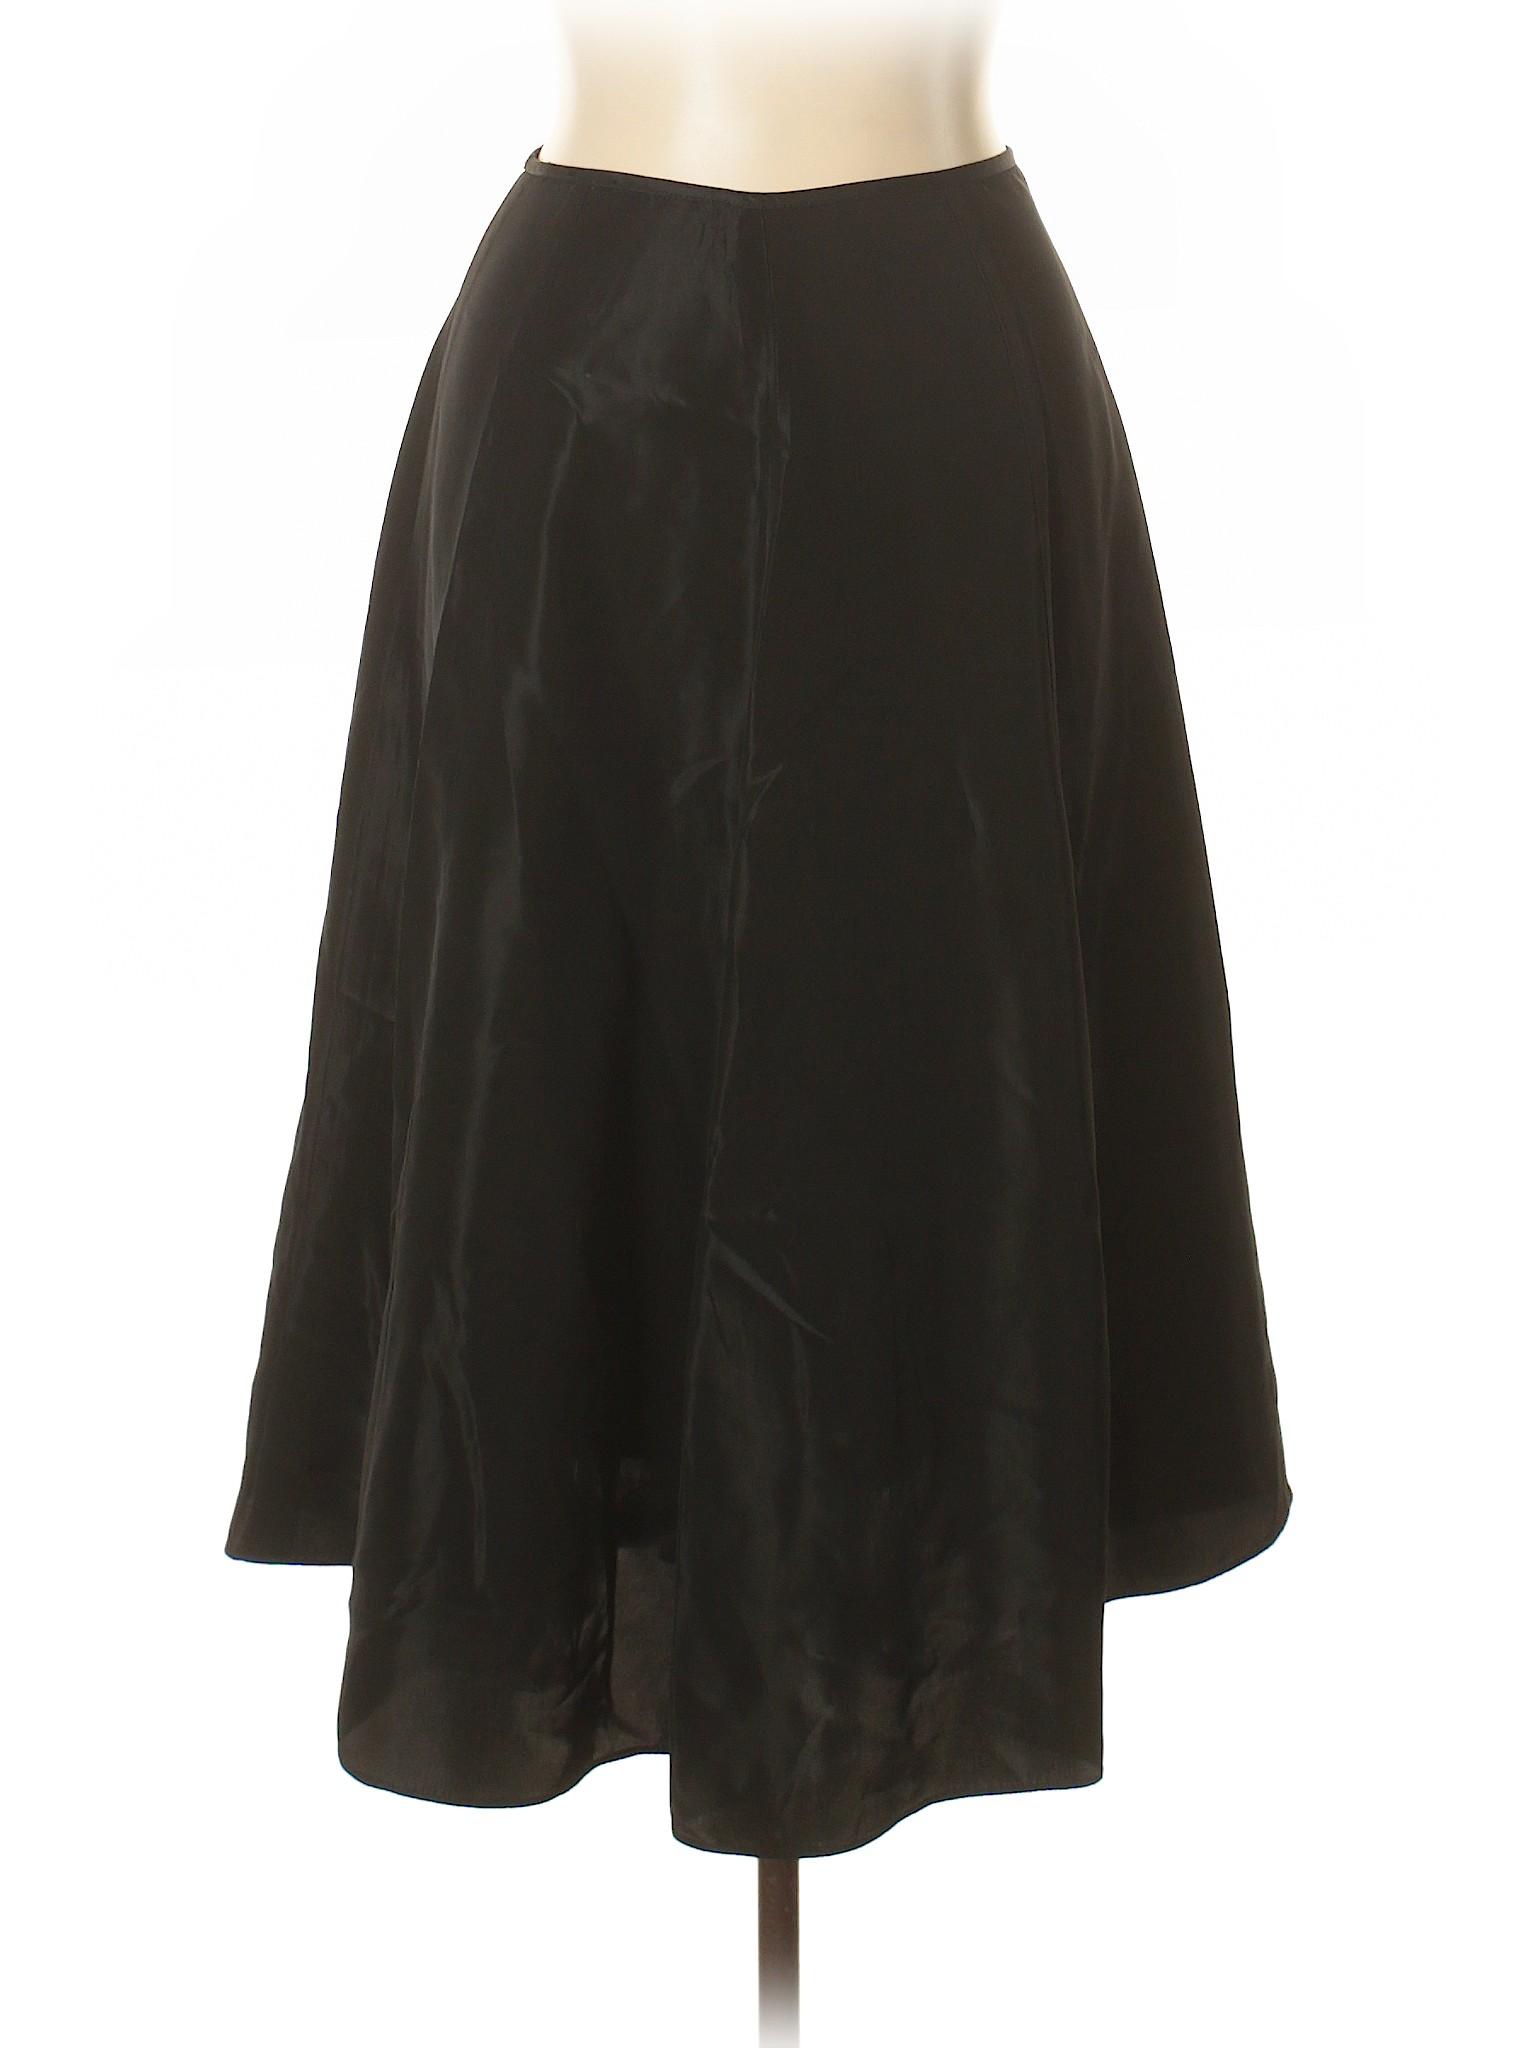 Formal Boutique Boutique Shelli Shelli Segal Skirt OYPxIqw